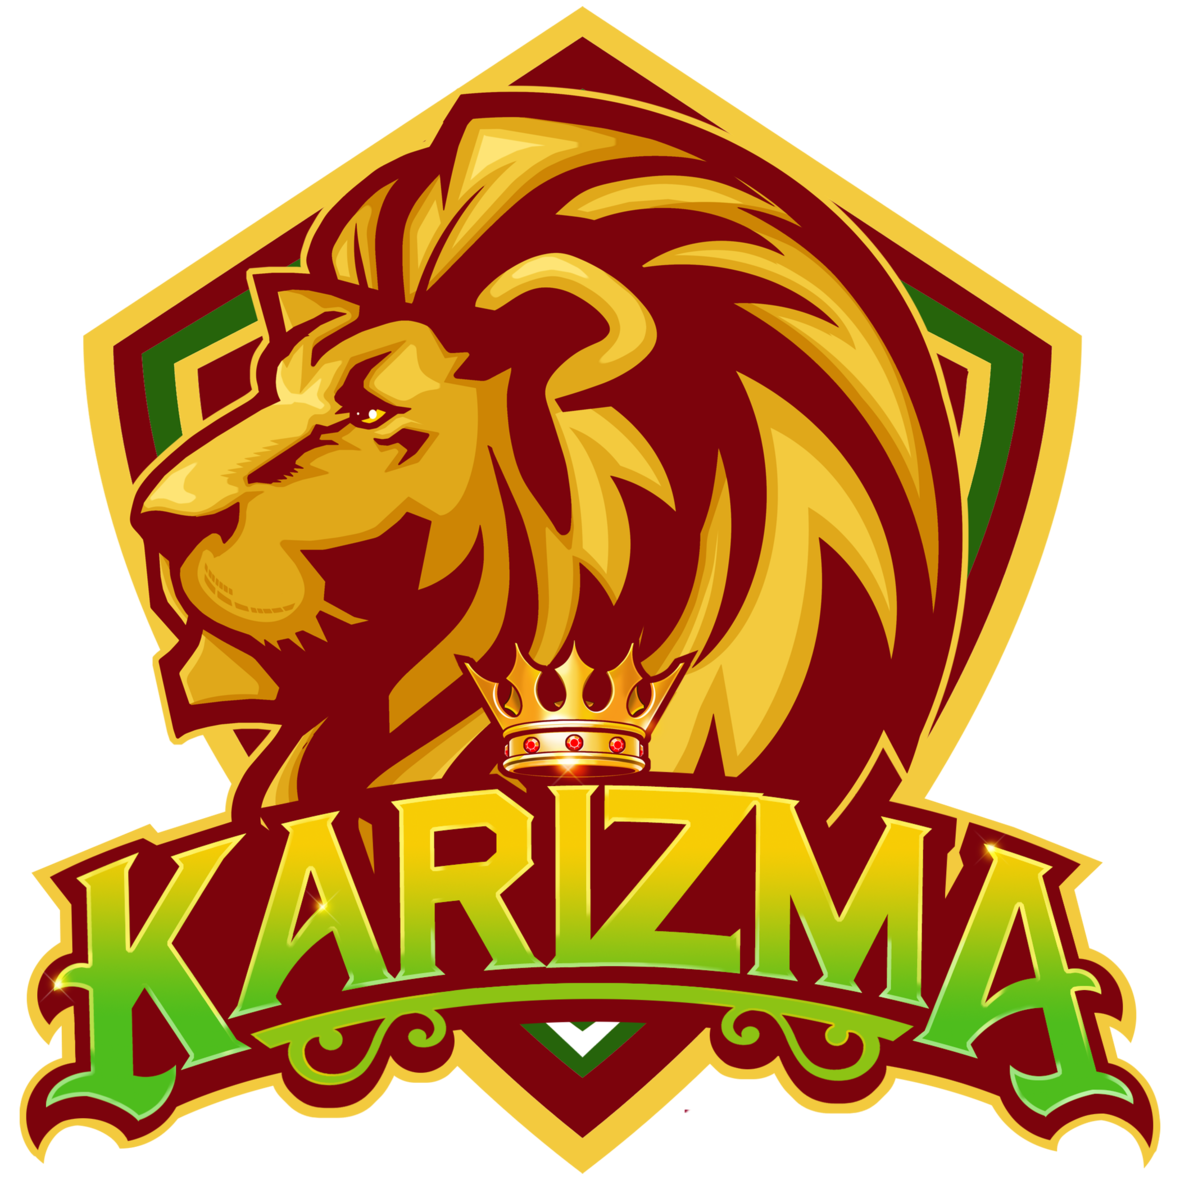 KARIZMA 01